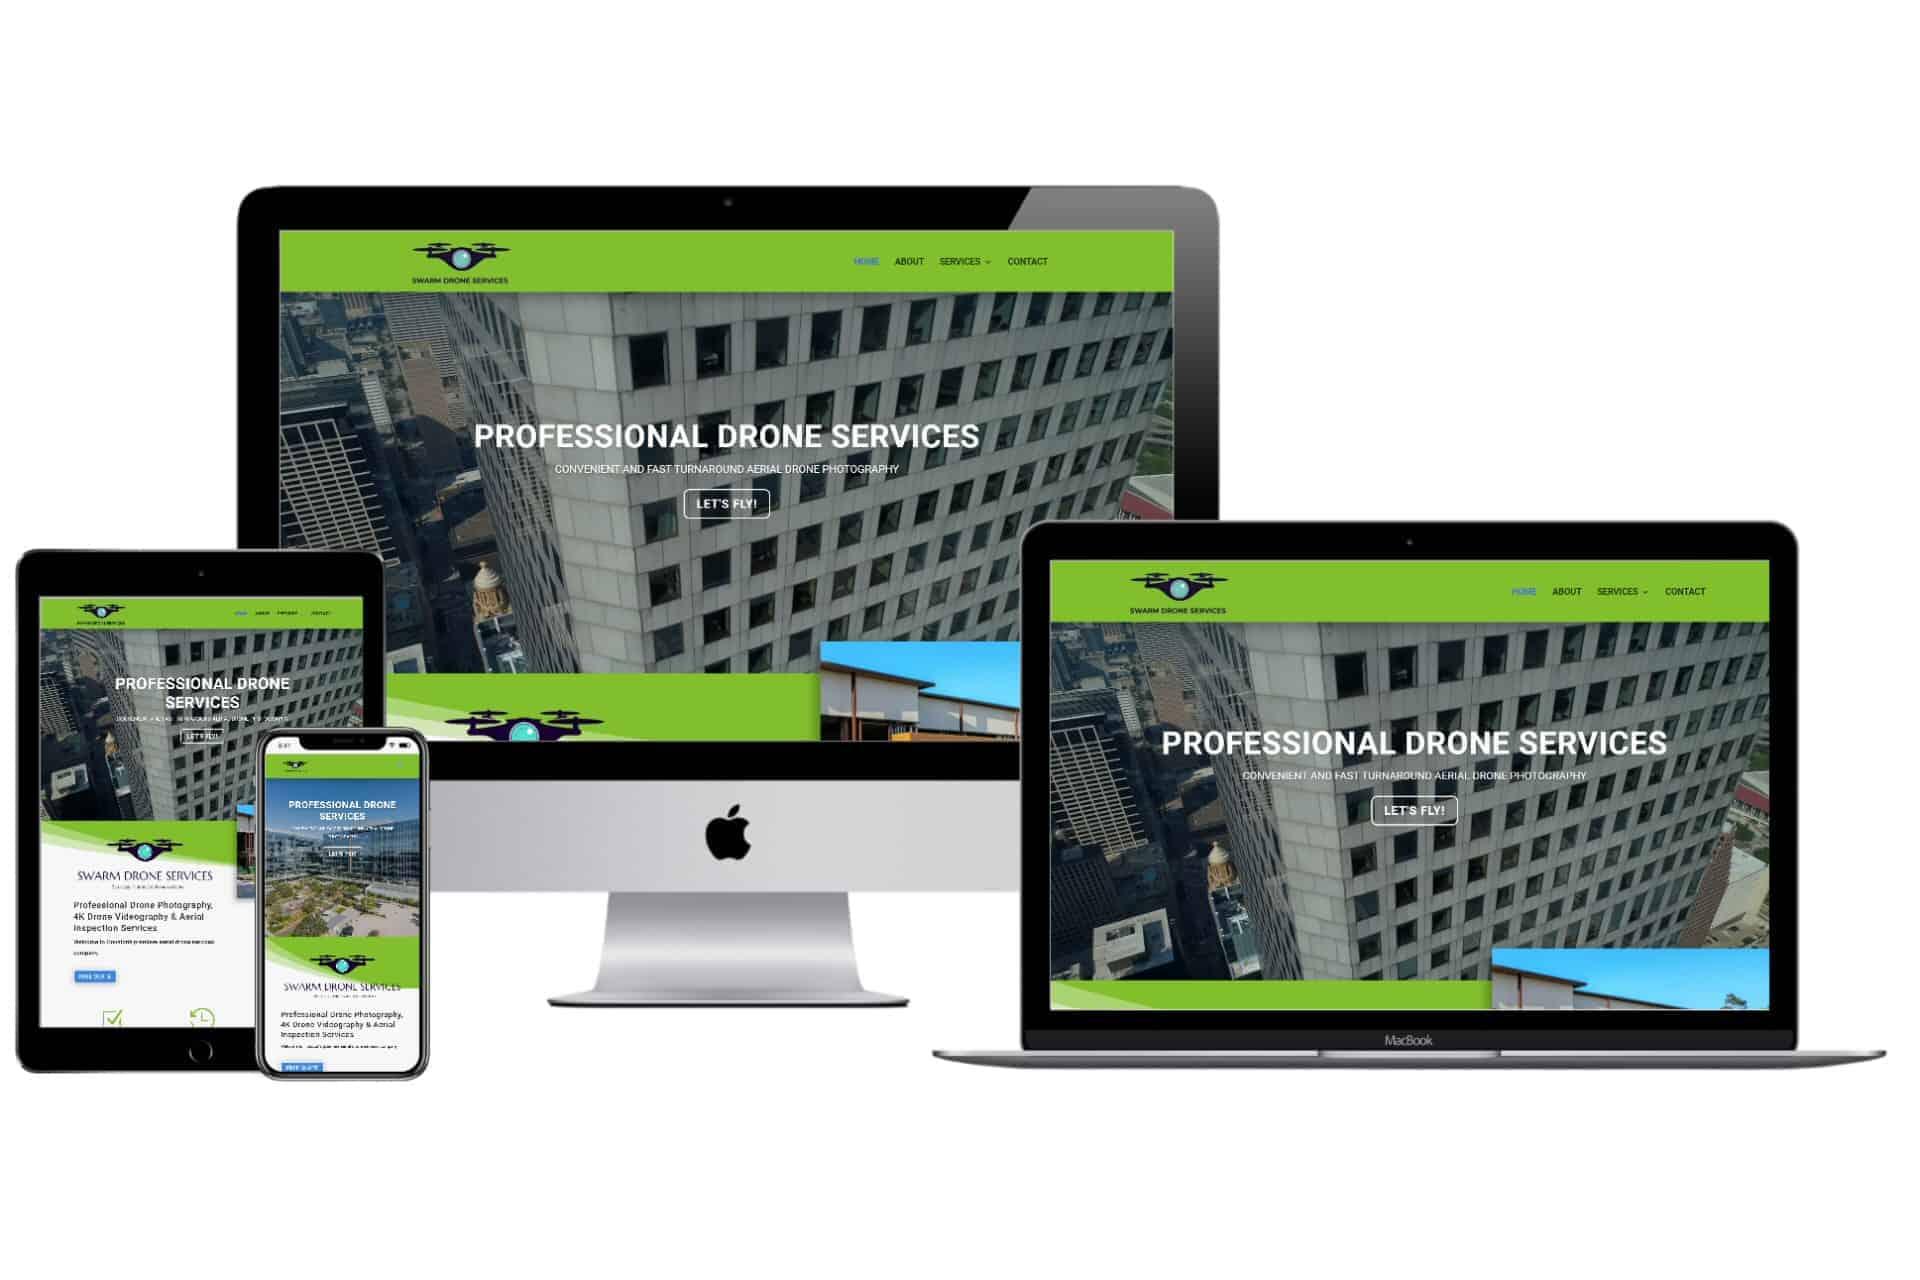 Swarm Drone Services Website Design by WizardsWebs Design LLC